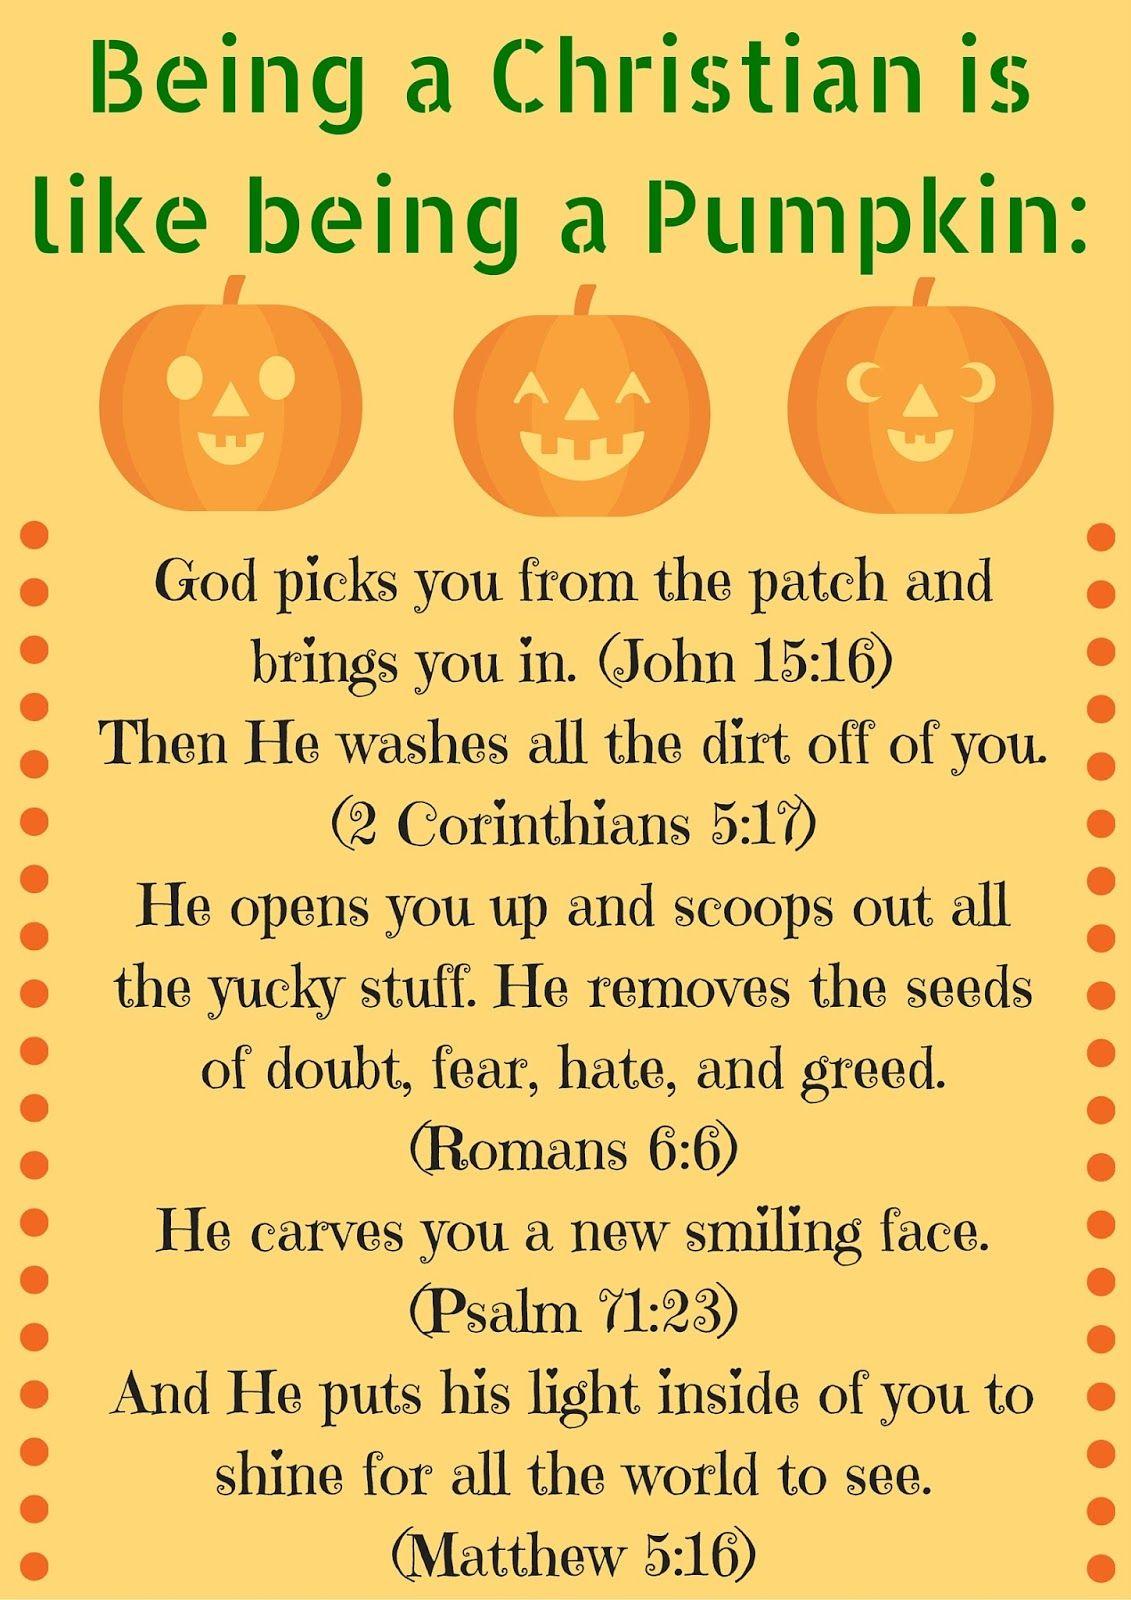 A Christian Pumpkin Windsock Craft Free Printable Kiddo Craft